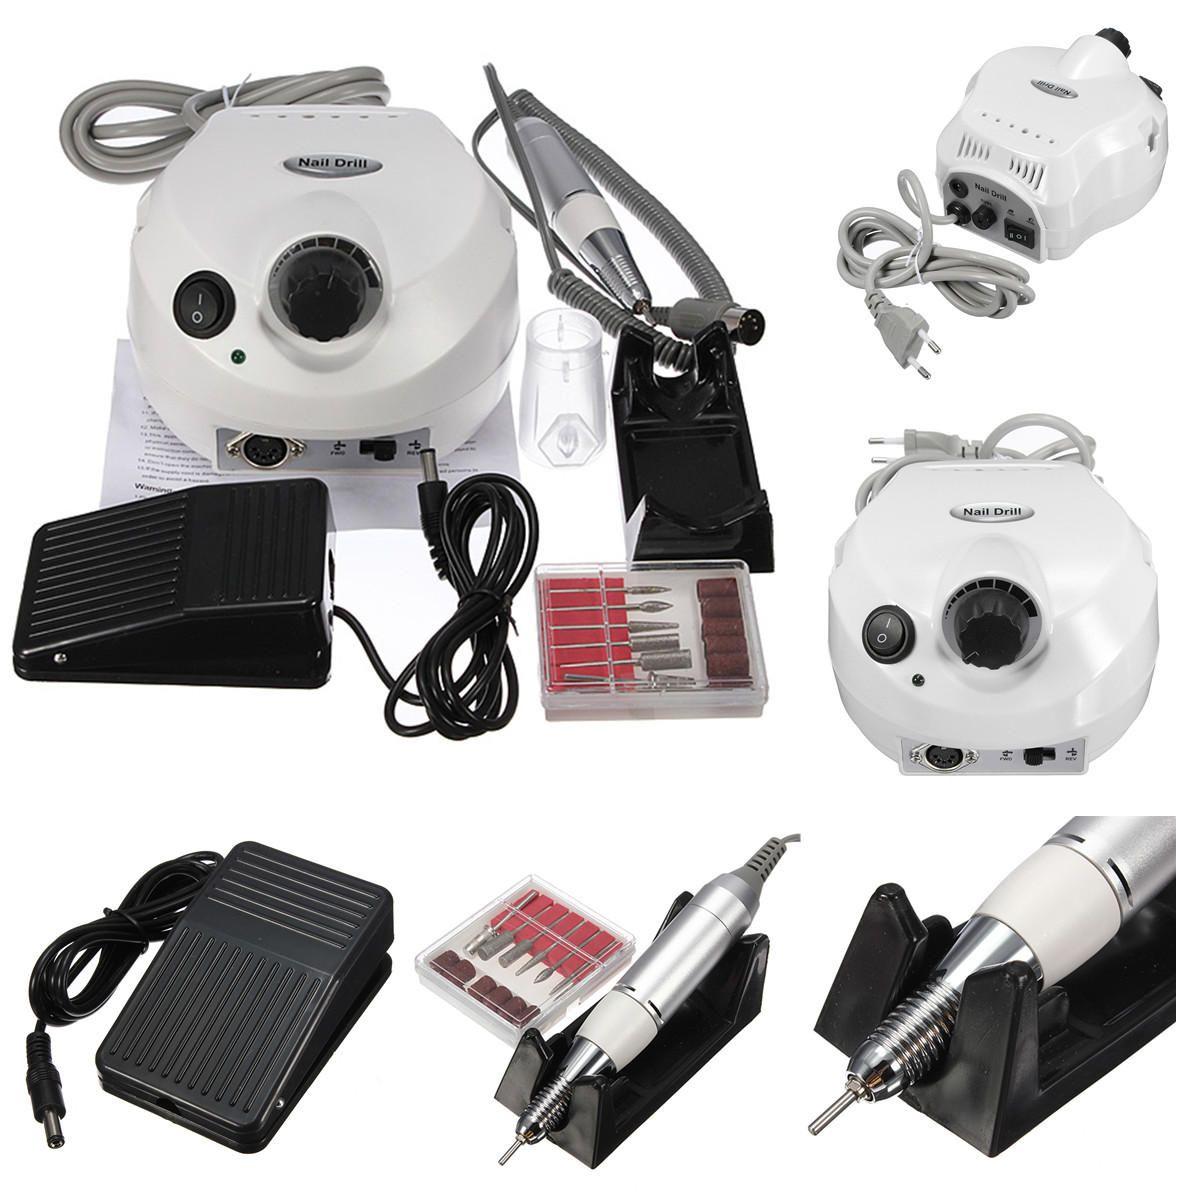 BYT US$55.47 AC 100-240V 15W Professional 30000RPM Manicure Electric Drill File Nail Art Pen Machine Kit Set